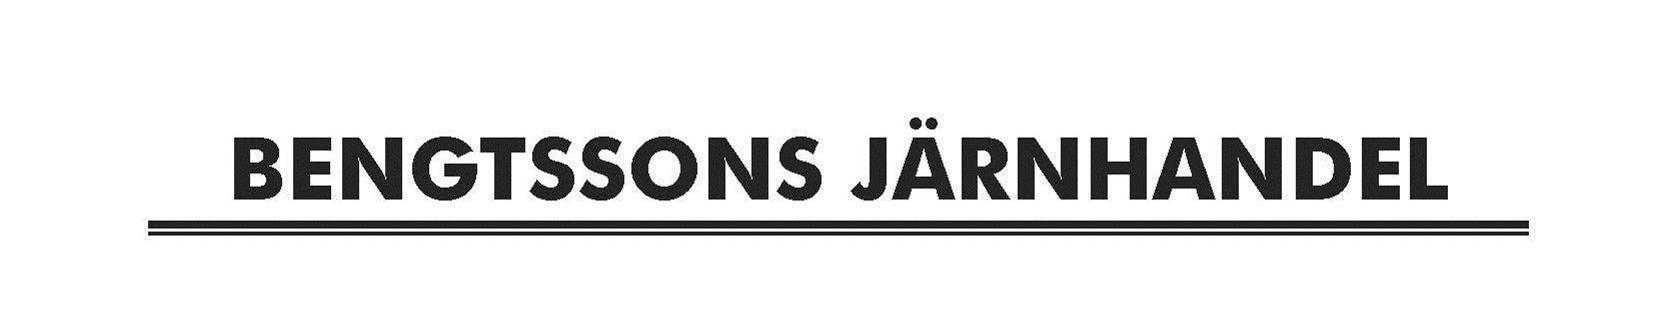 © Bengtssons Järnhandel i Ryd, Sportfischenausrüstung bei Bengtssons Järnhandel, Ryd